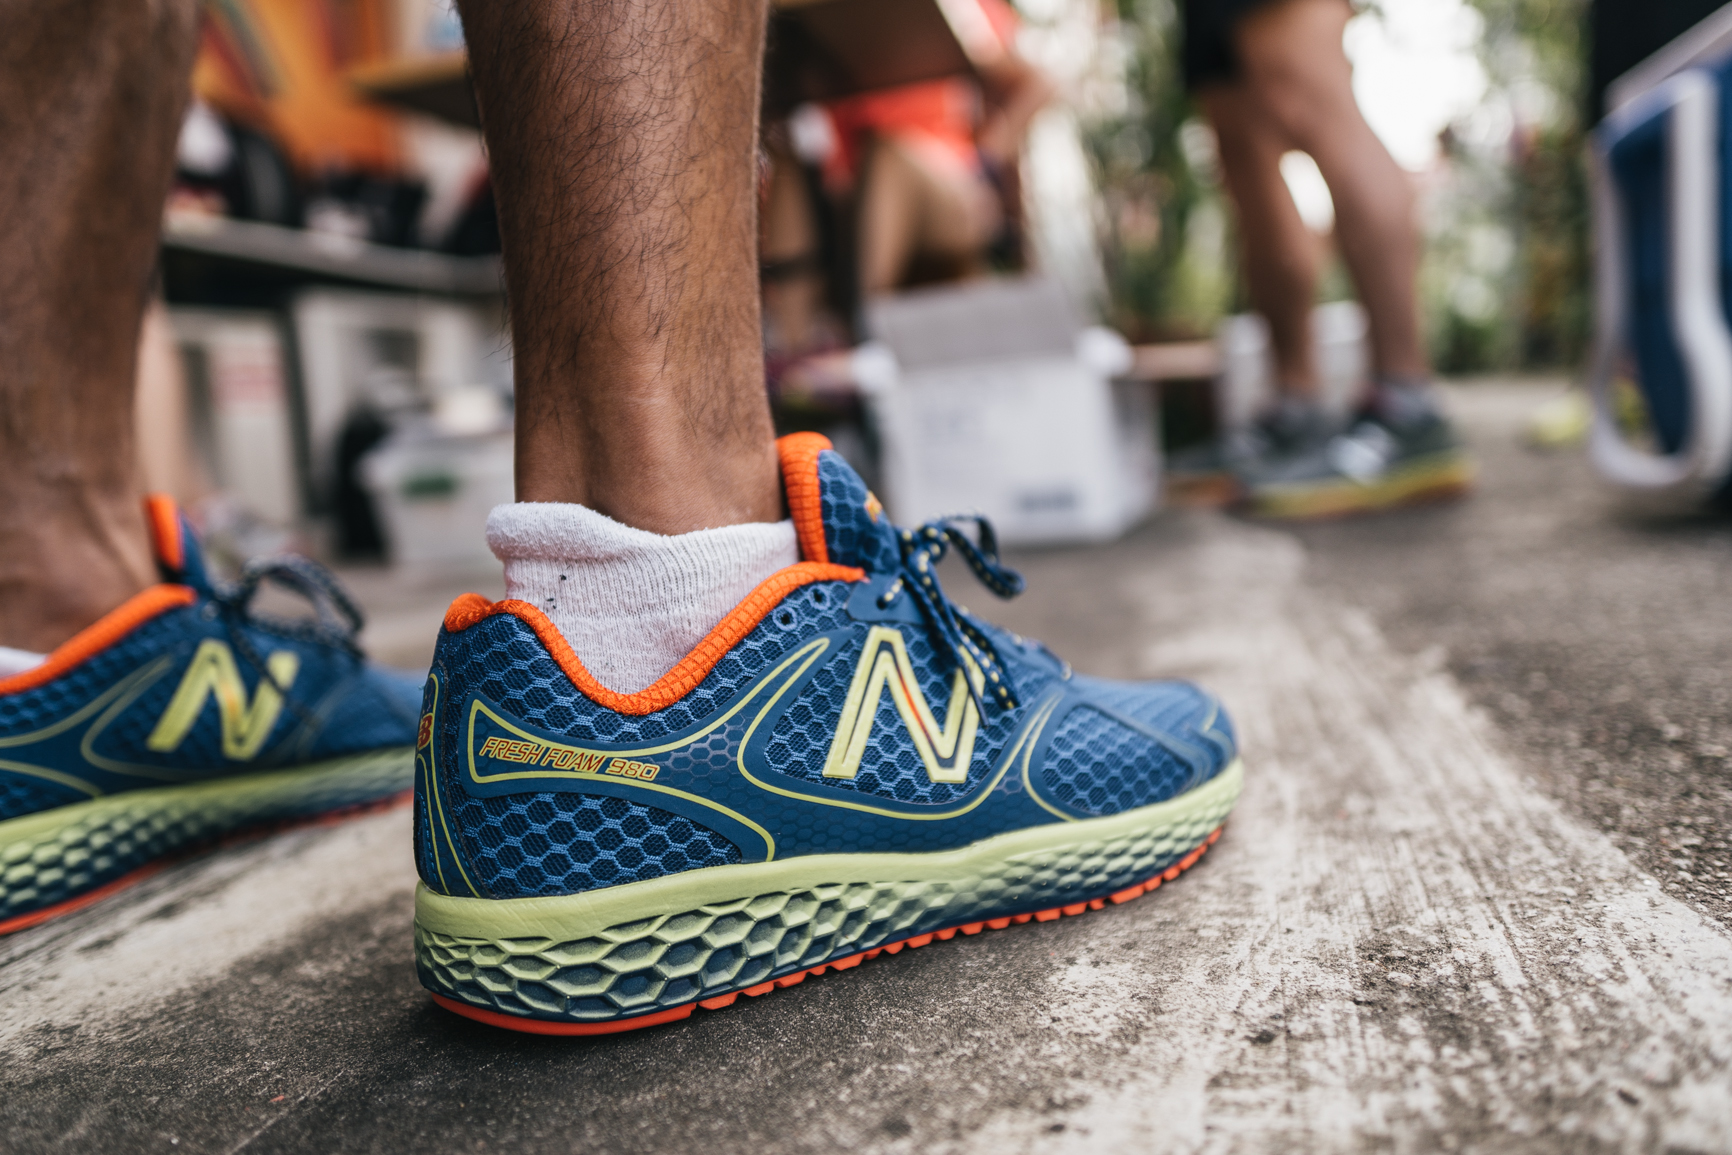 new balance 980 heel drop